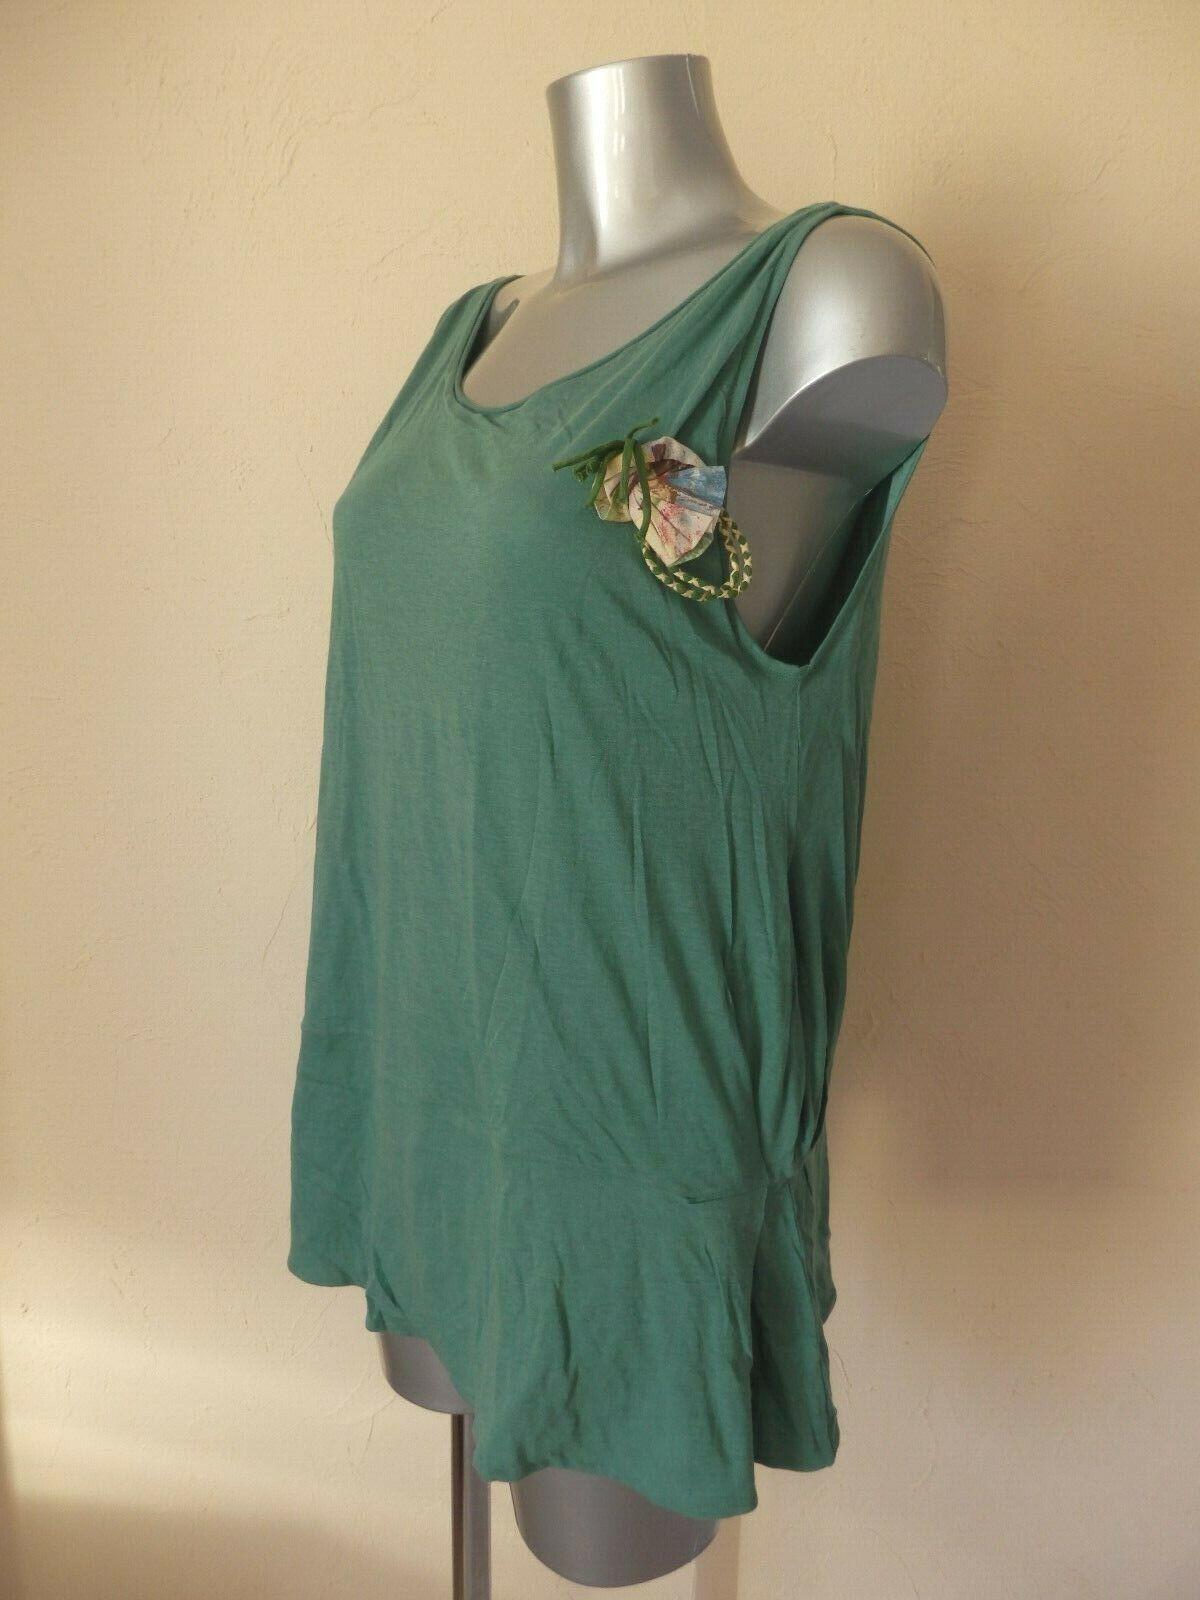 MARNI - Tee-Shirt - Tunique - coton green - size 42it soit 38 40fr